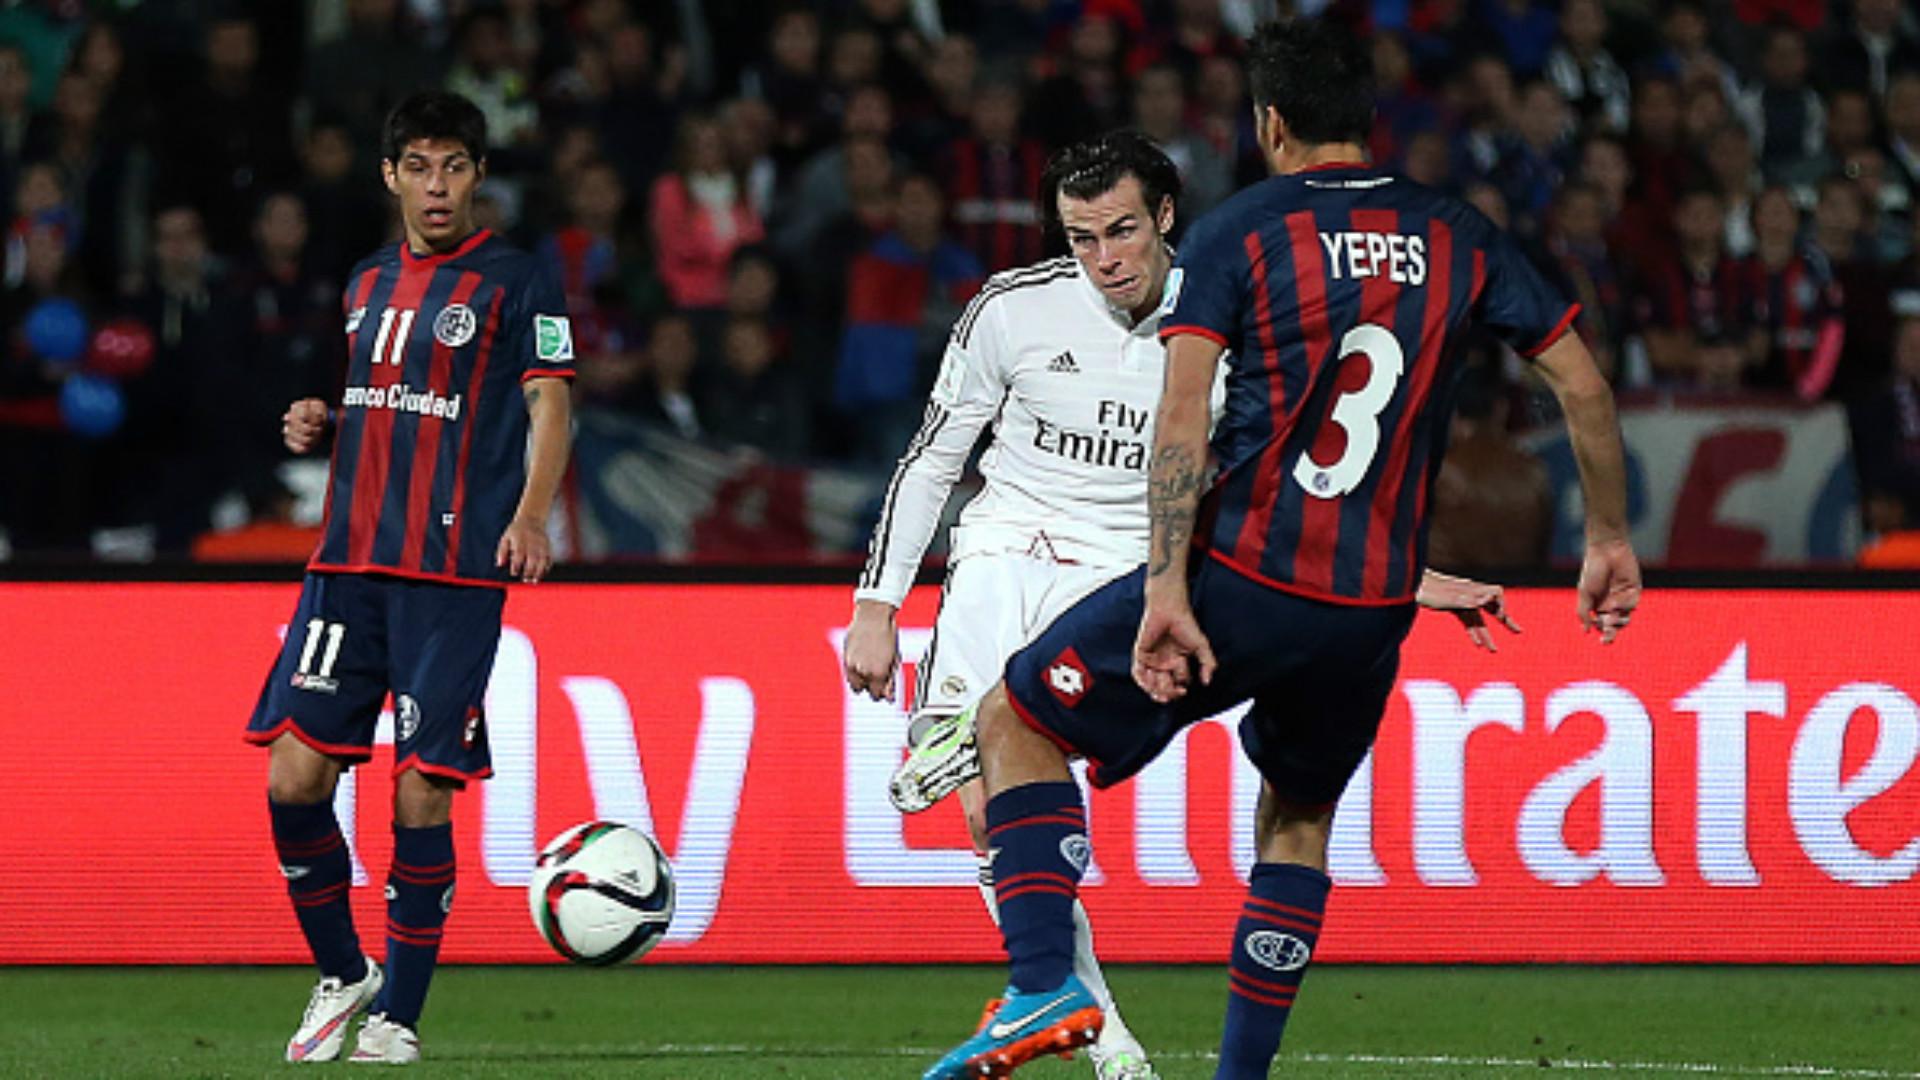 Mundial De Clubes: Final Del Mundial De Clubes 2014 Real Madrid Vs San